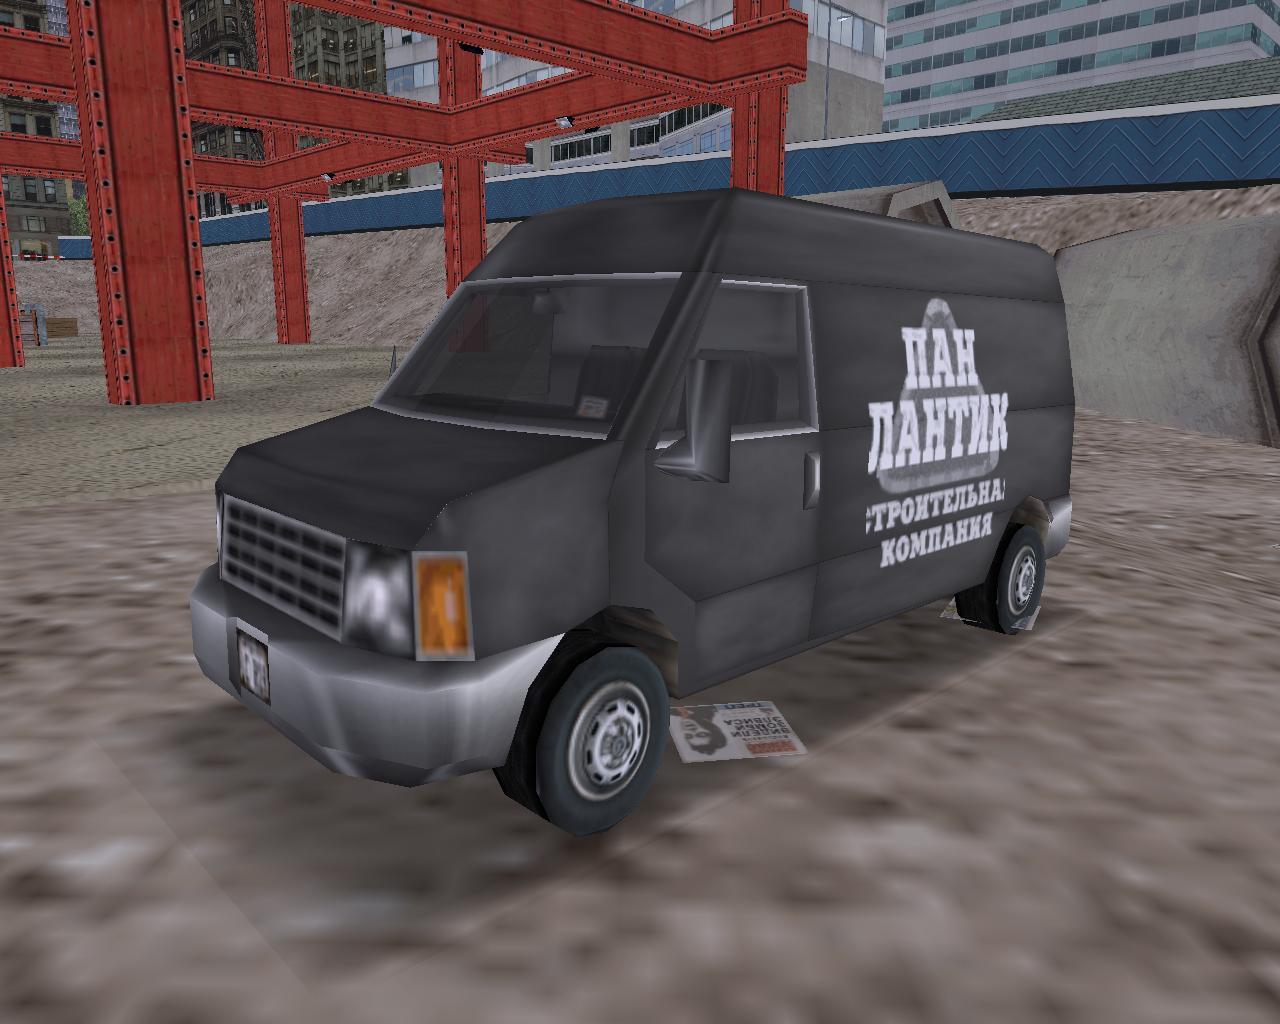 27. Panlantic (RM) - Grand Theft Auto 3